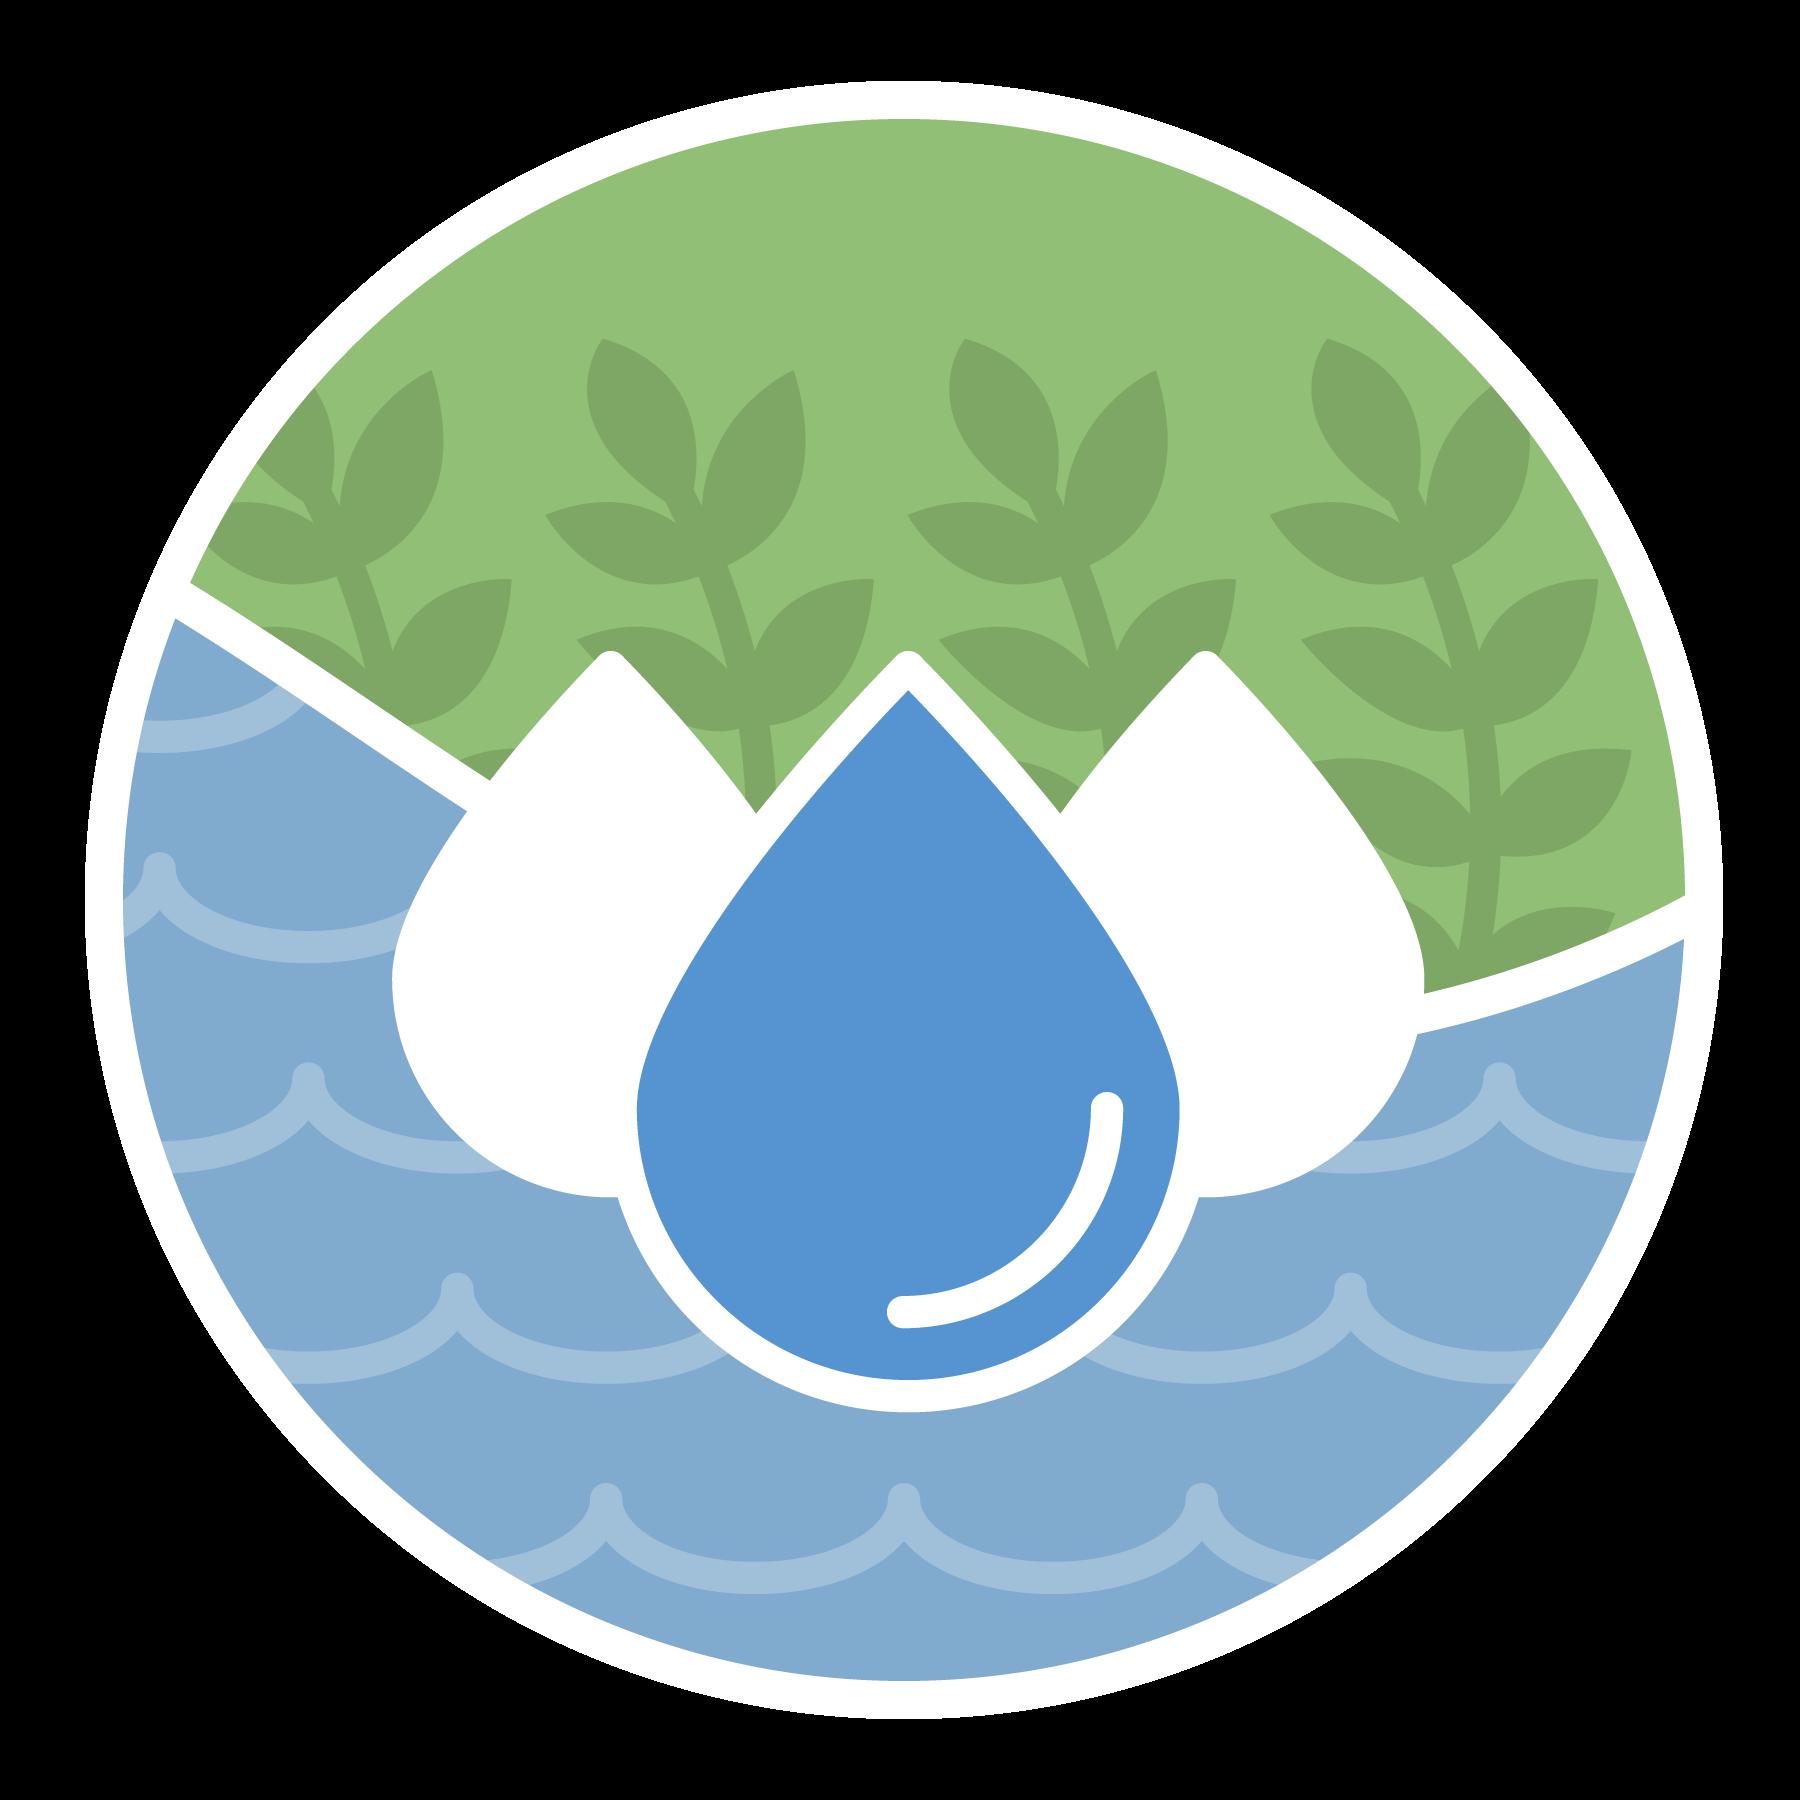 Environmental protection Logos